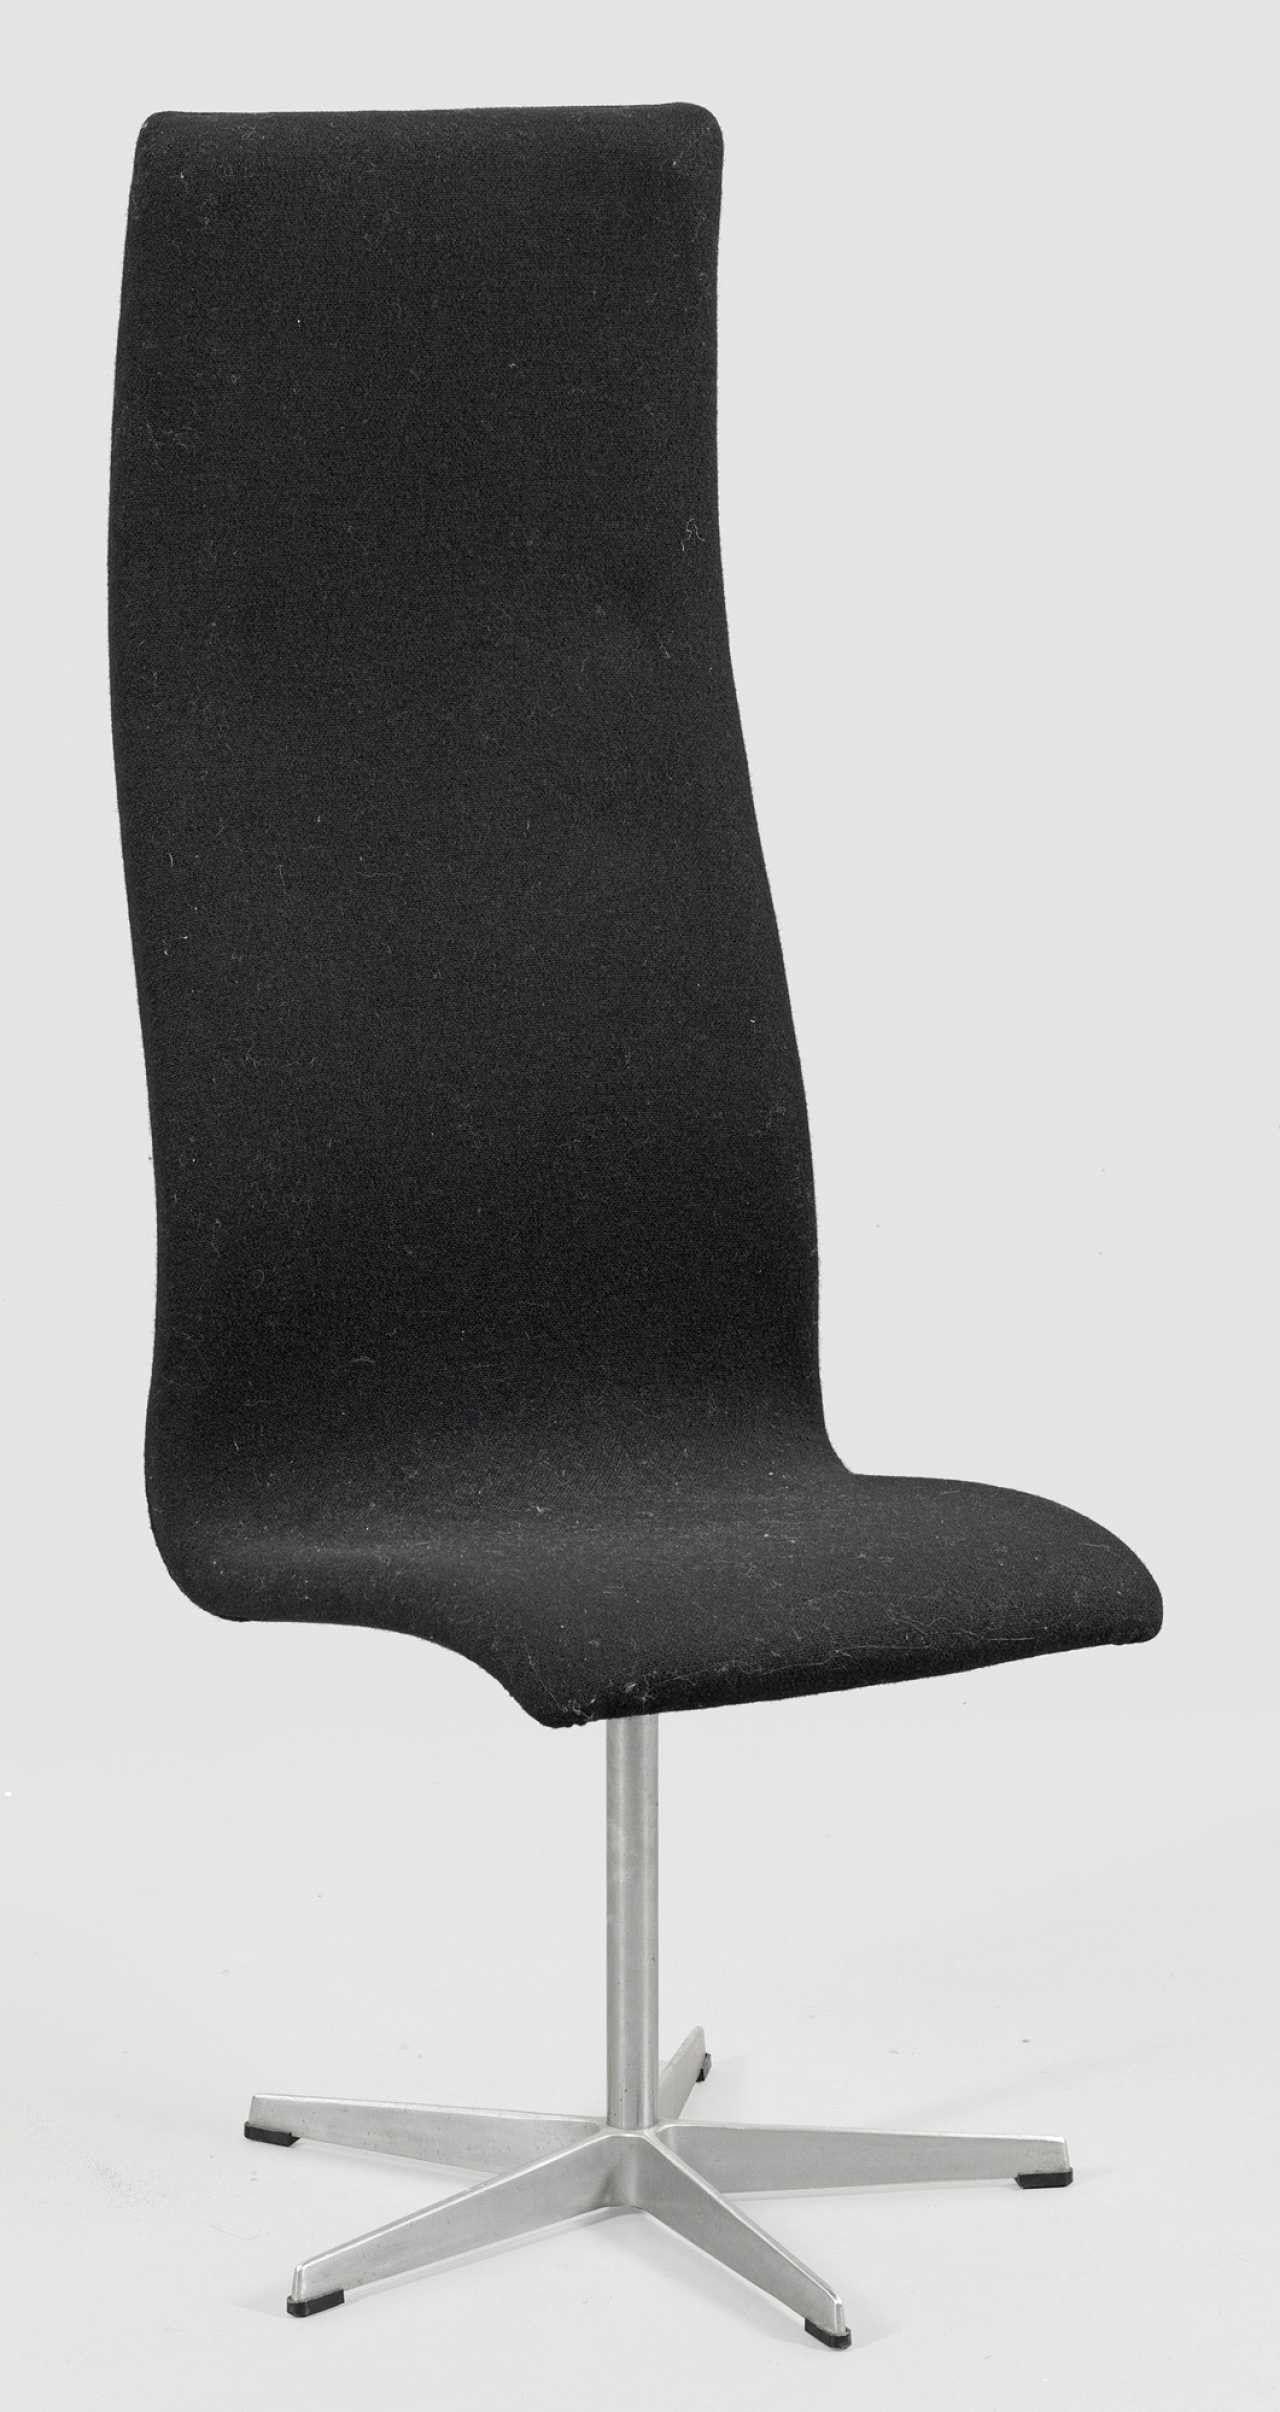 Arne Jacobsen Fritz Hansen Kontorstol Oxford chair